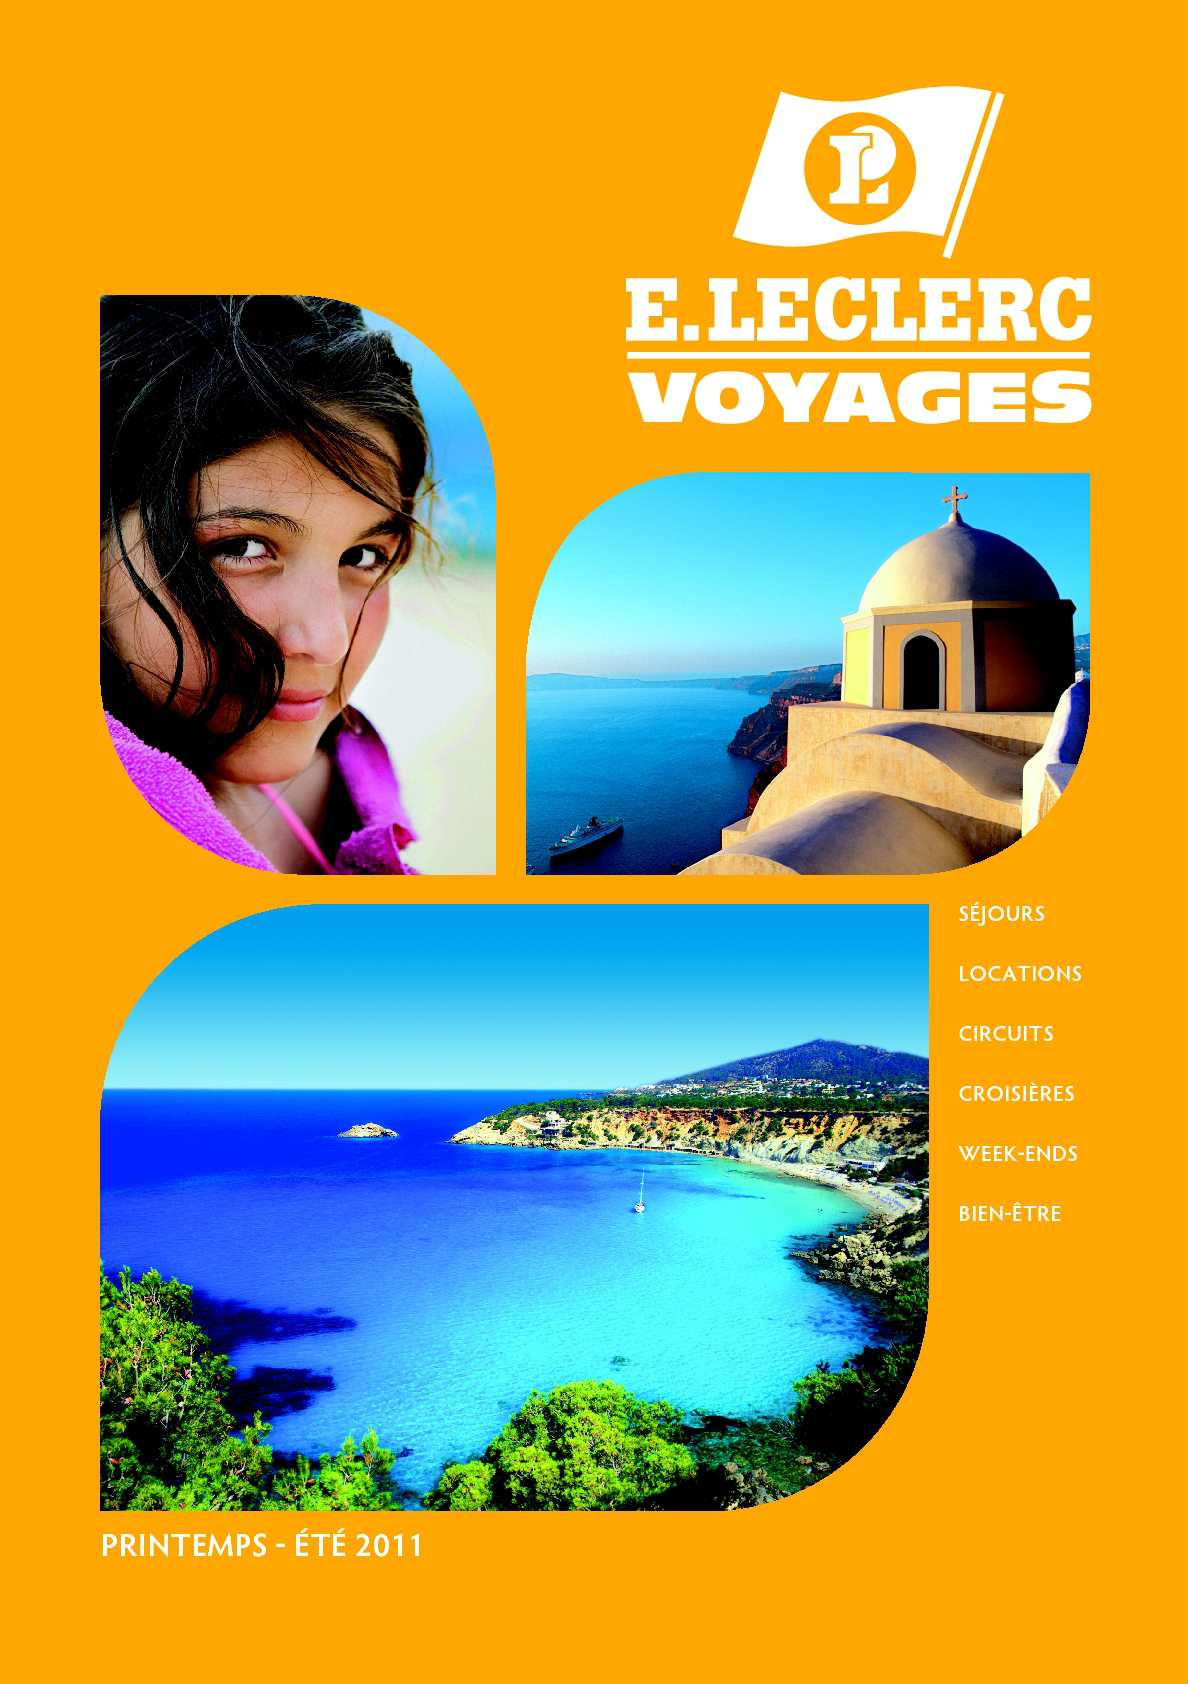 Calam o e leclerc voyages brochure t 2011 for Leclerc brochure